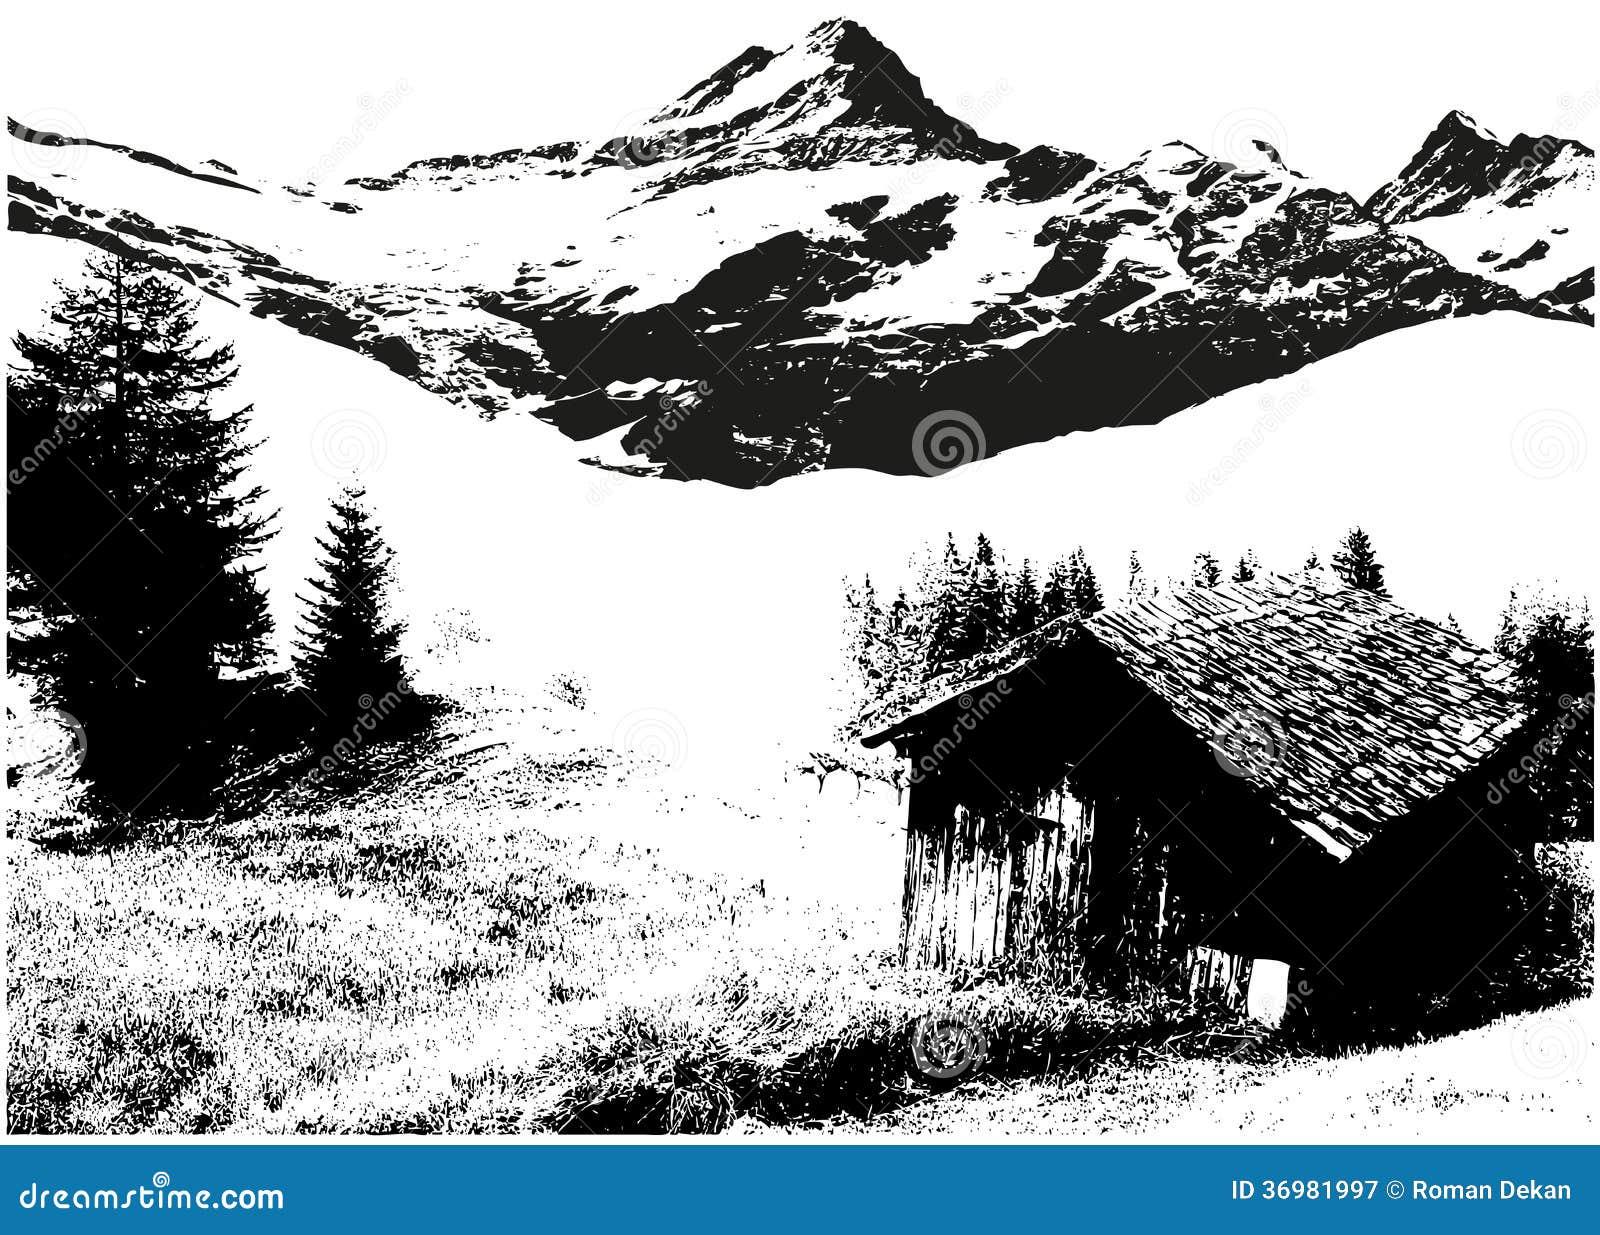 Landscape Illustration Vector Free: Mountain Landscape Stock Vector. Illustration Of Hill